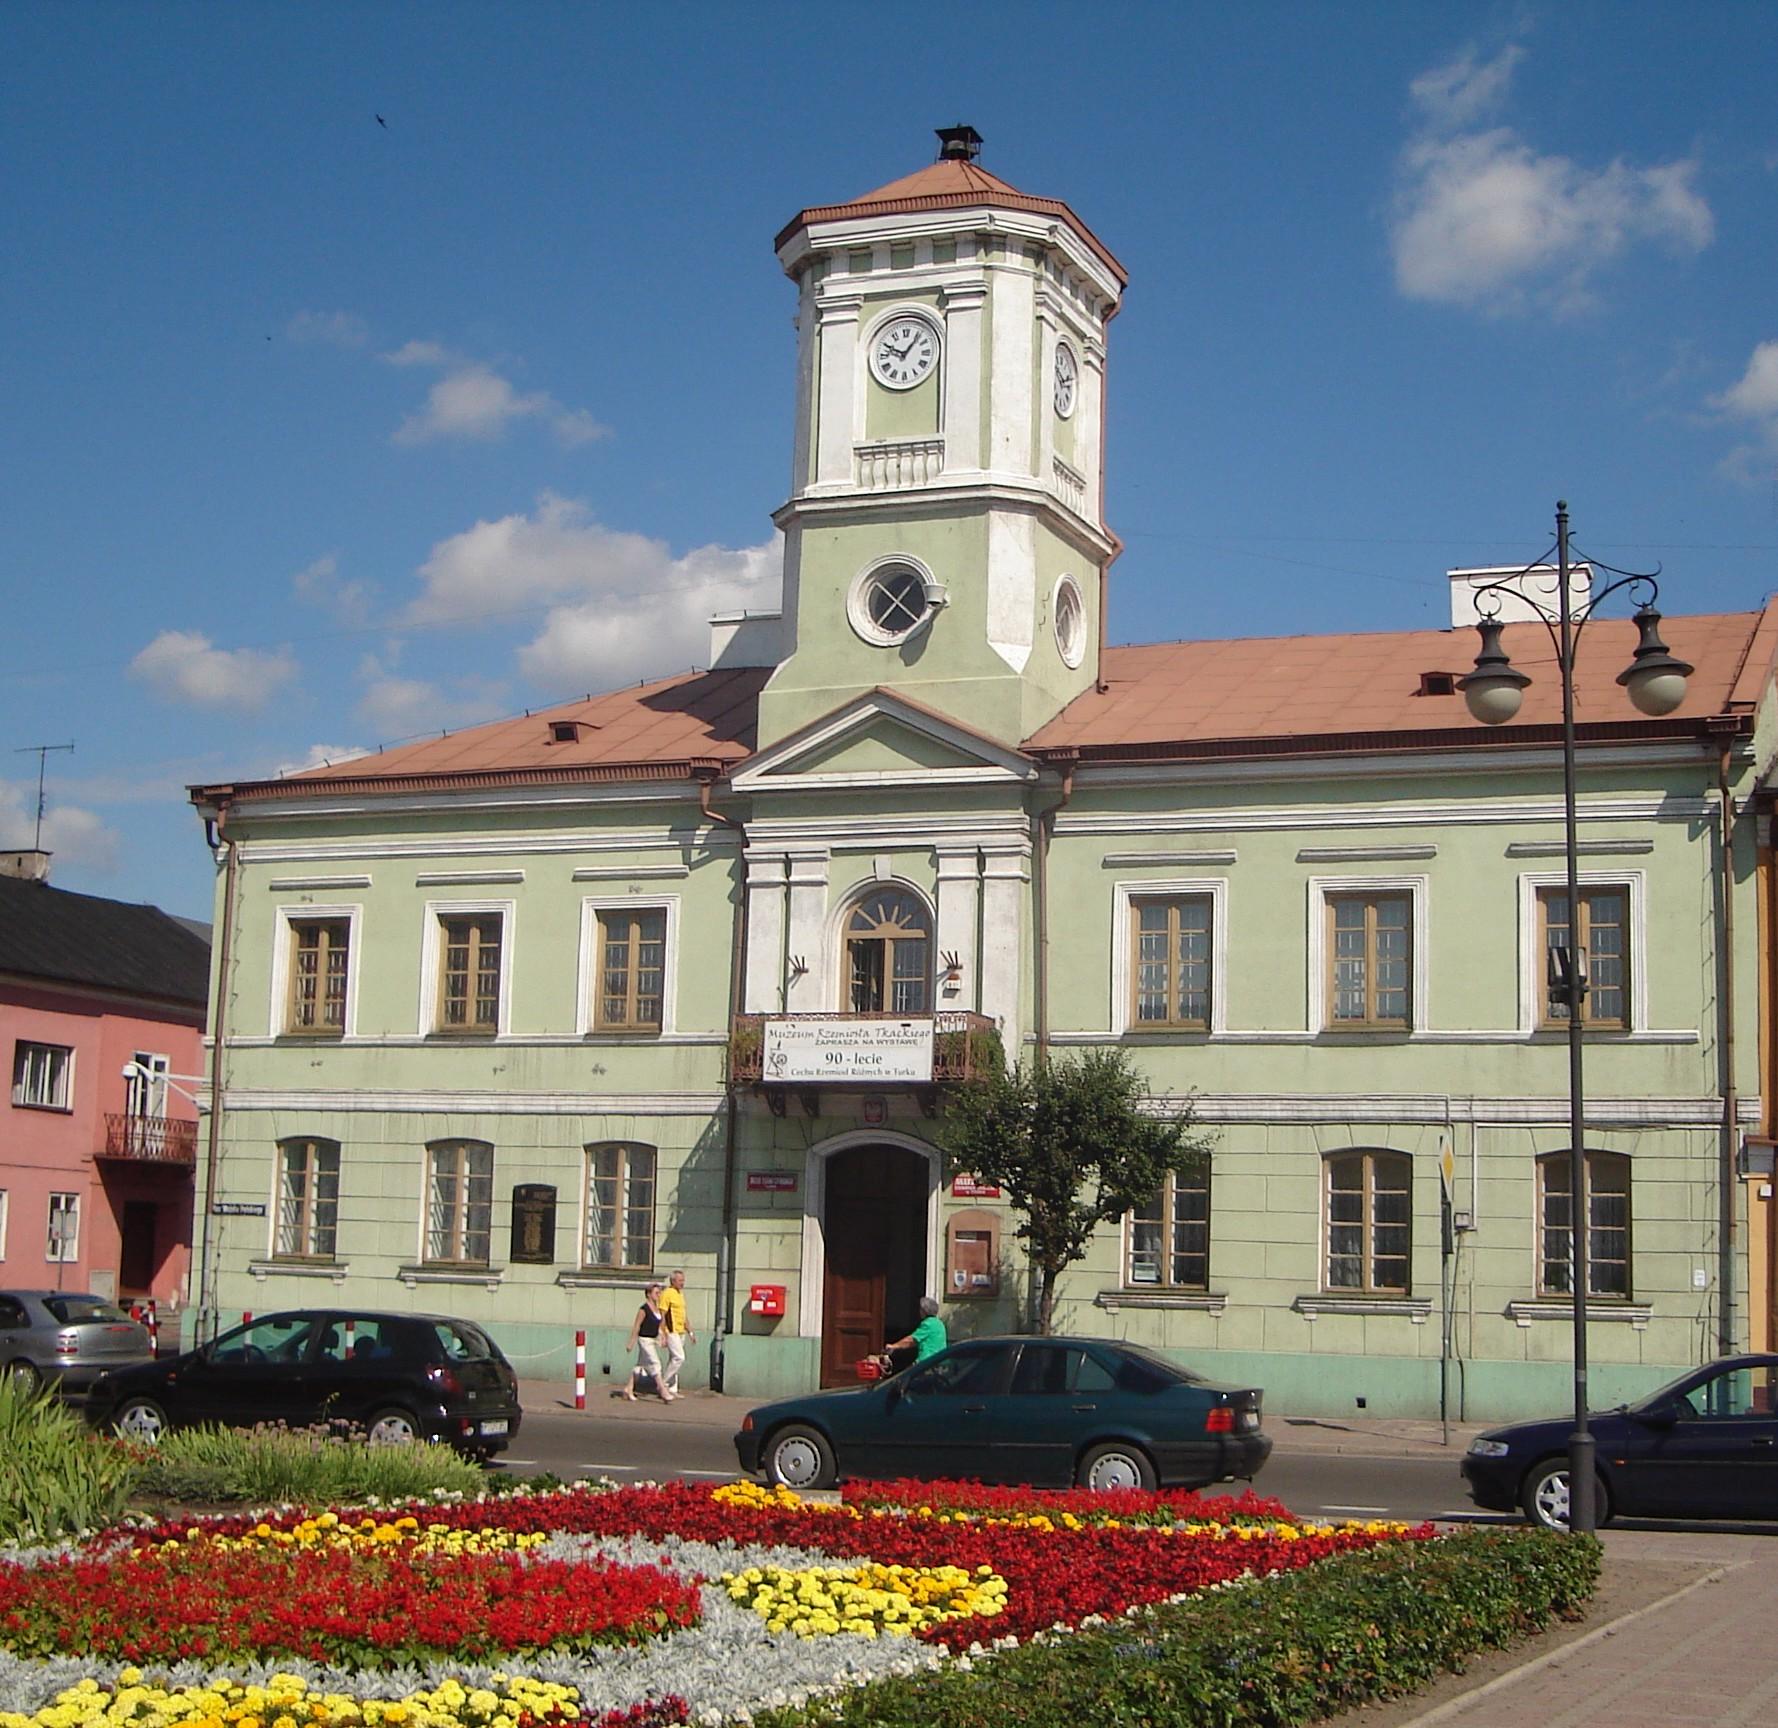 File:Turek ratusz.jpg - Wikimedia Commons